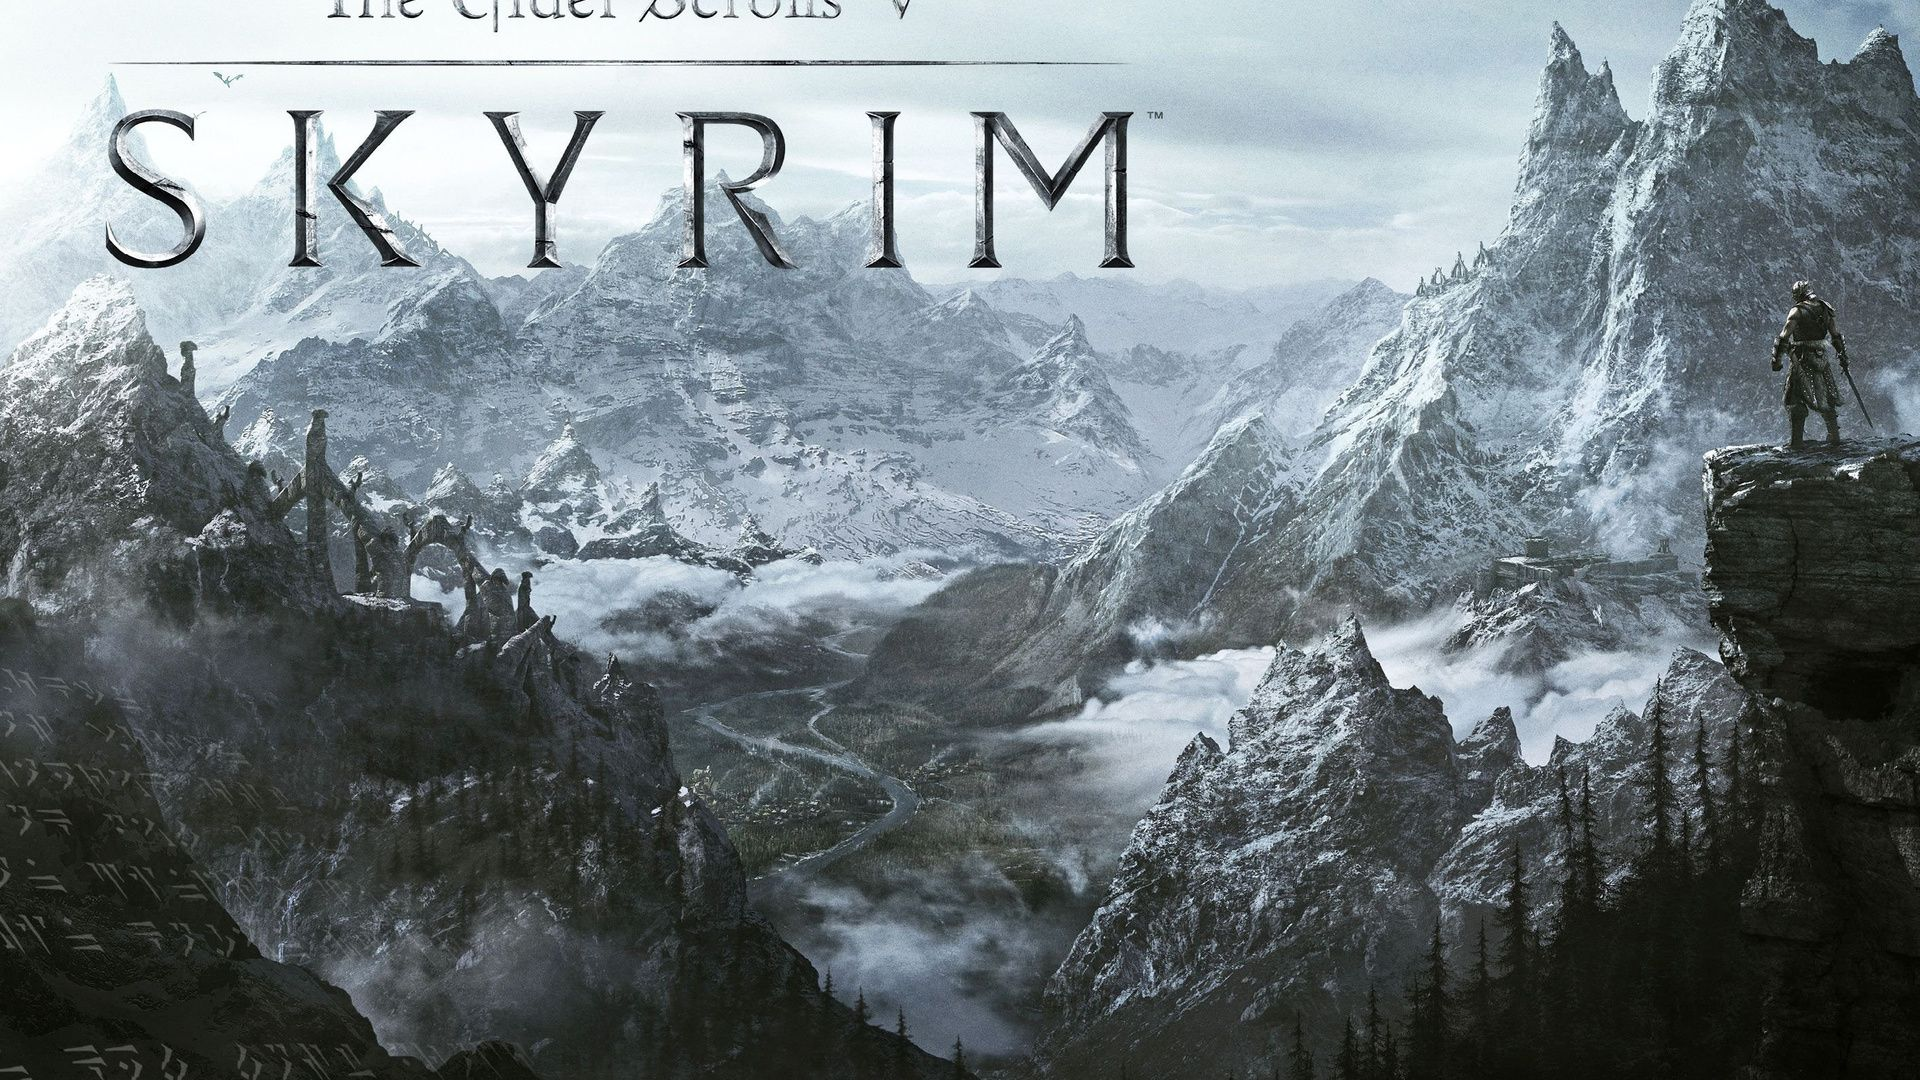 Skyrim Skyrim Elder Scrolls Skyrim Elder Scrolls